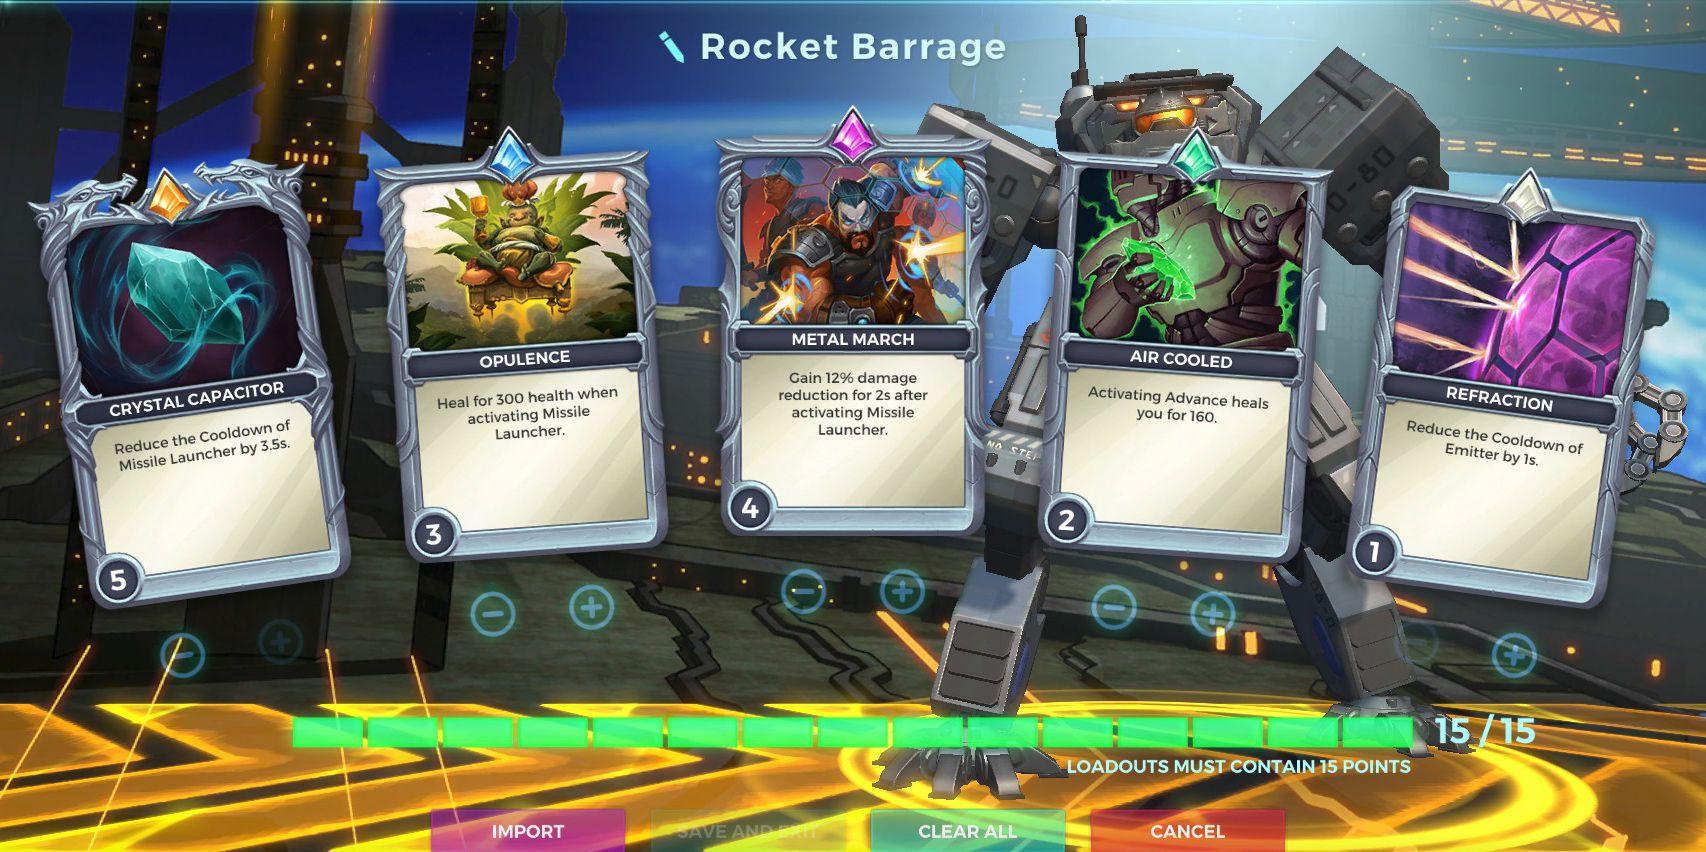 Rocket Barrage, Ruckus Offensive Loadout, Paladins